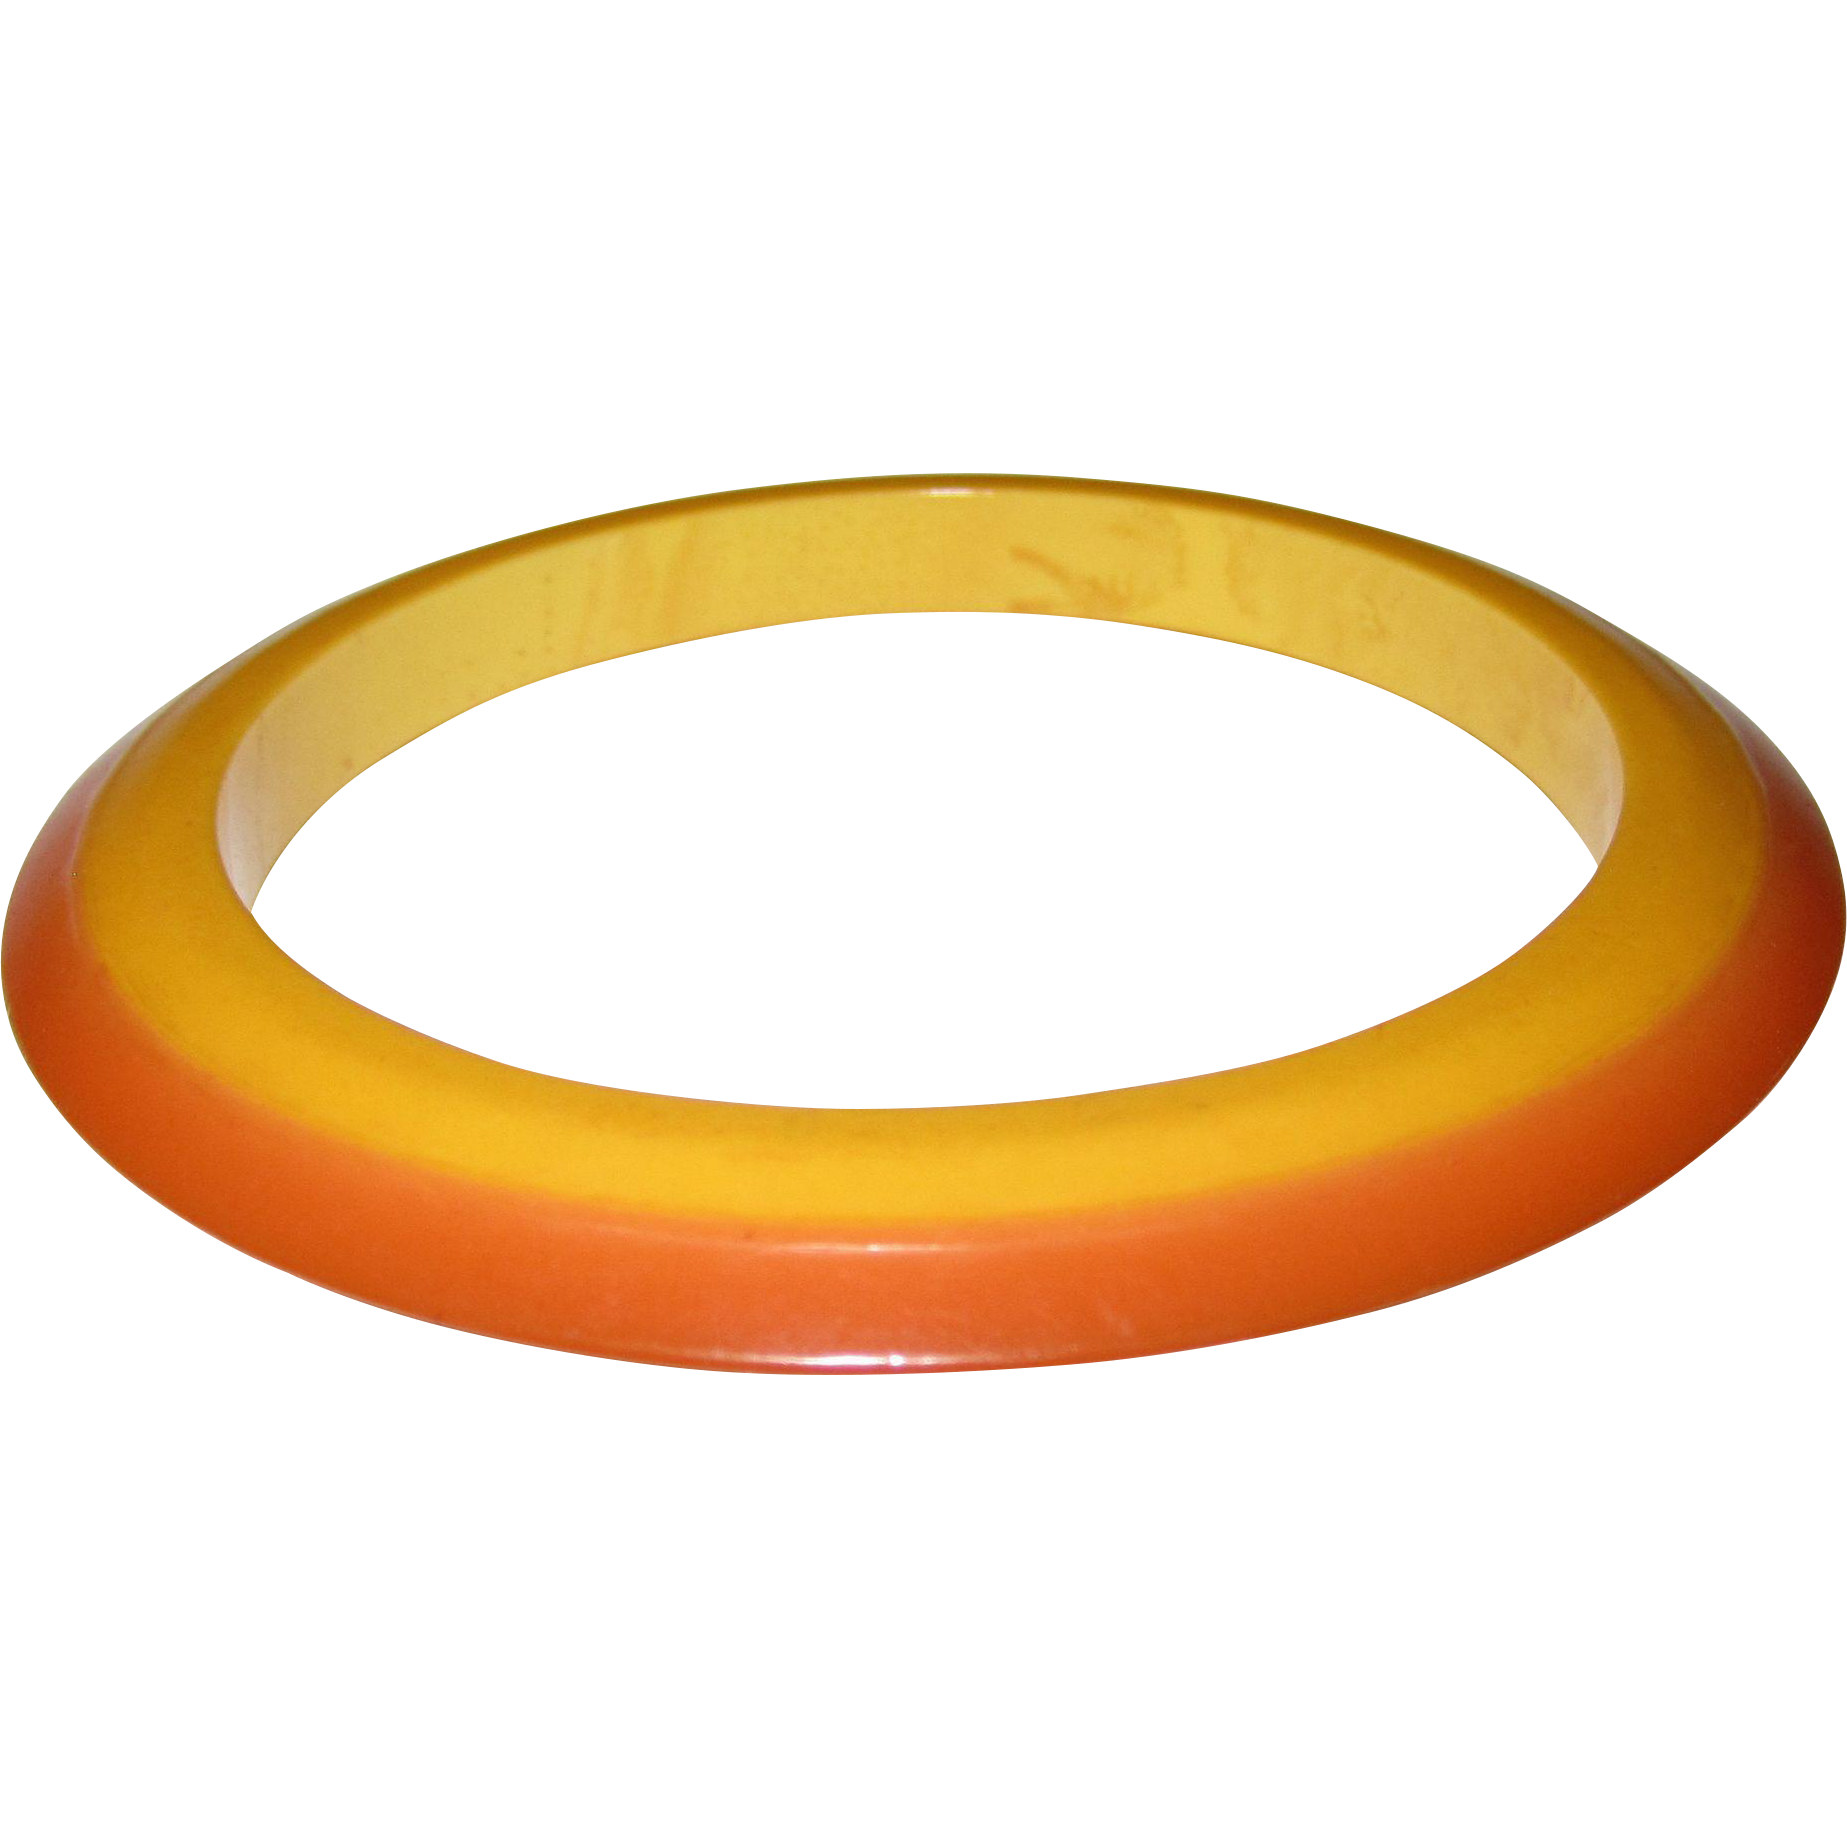 Vintage Fall Jewelry -- Laminated Two-Tone Bakelite Flying Saucer Bangle Bracelet -- found at www.rubylane.com #vintagebeginshere